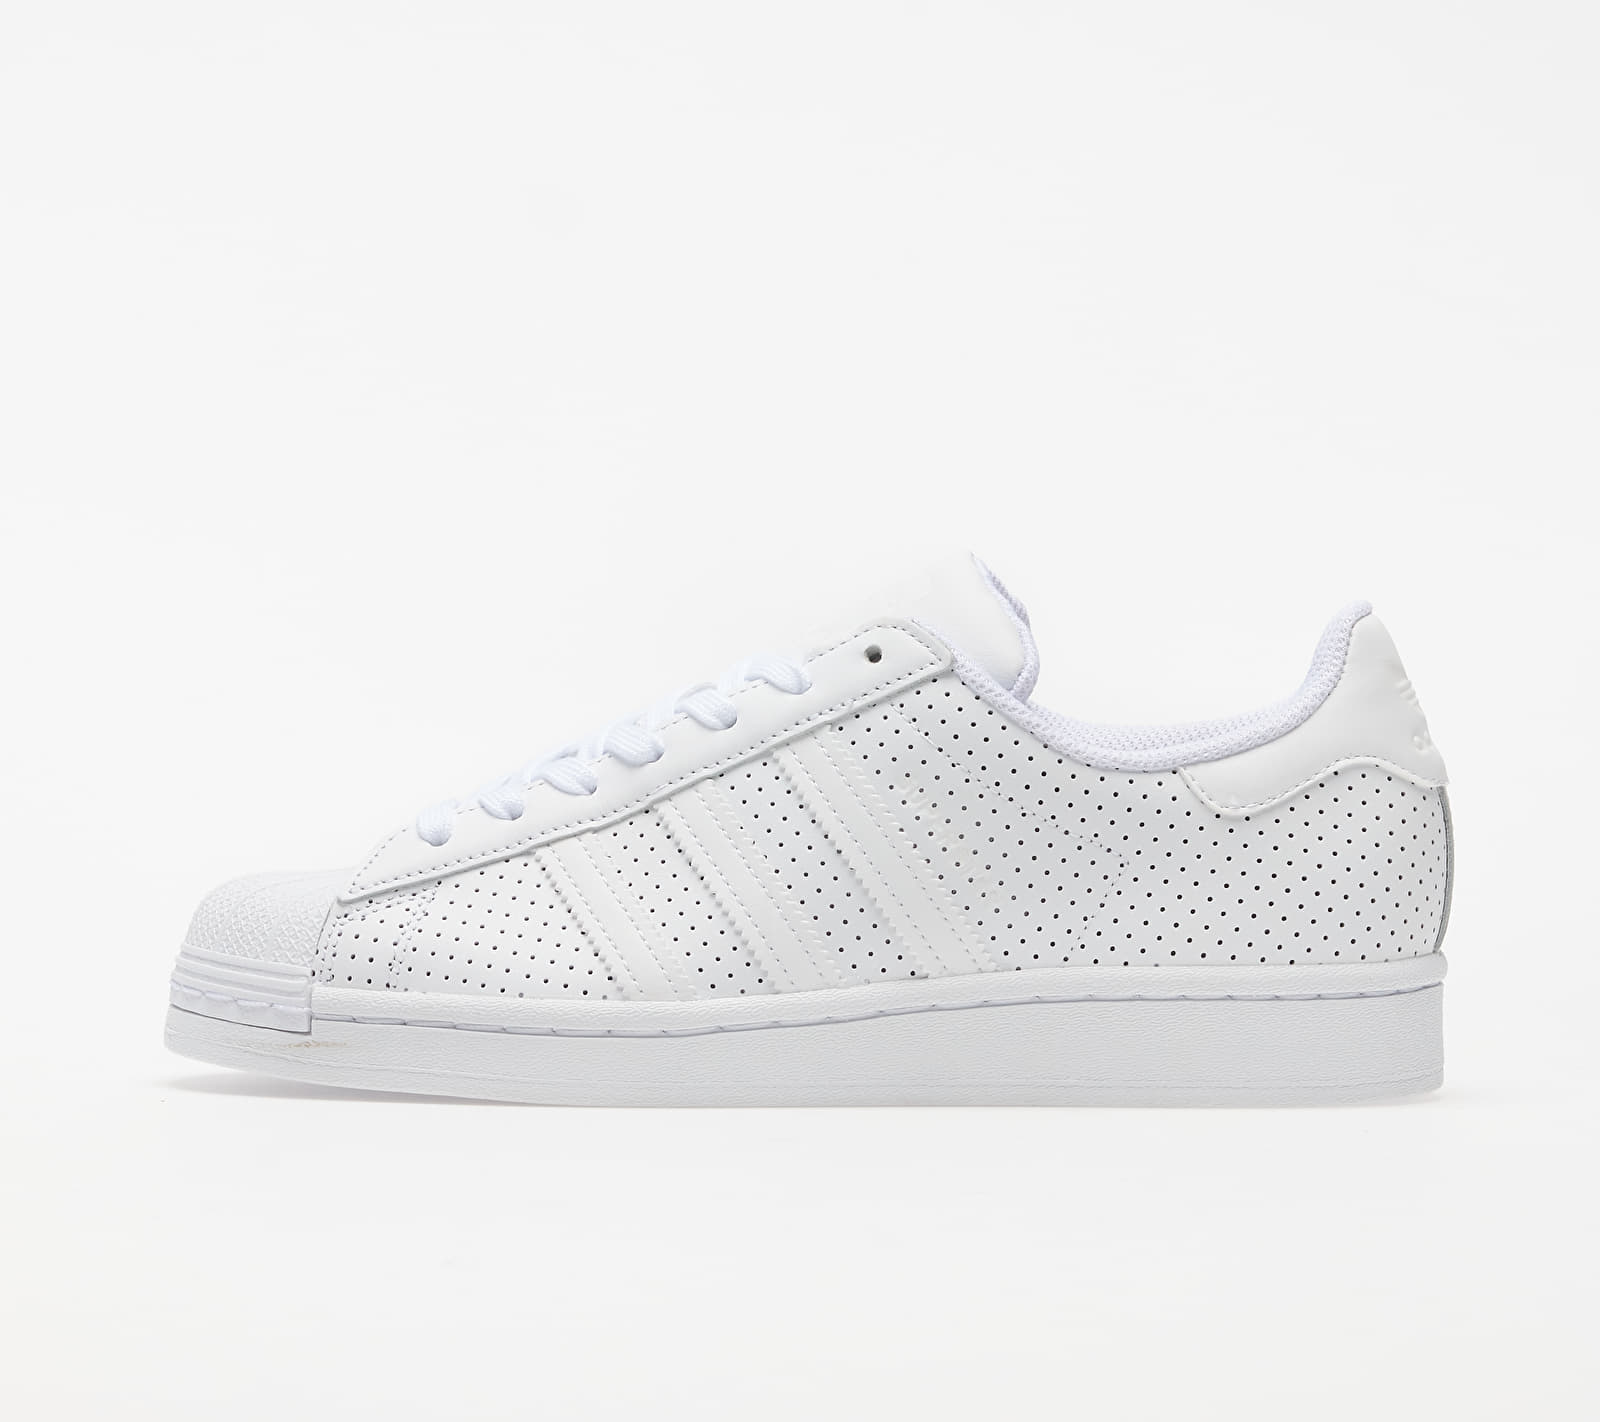 adidas Superstar W Ftw White/ Ftw White/ Ftw White EUR 38